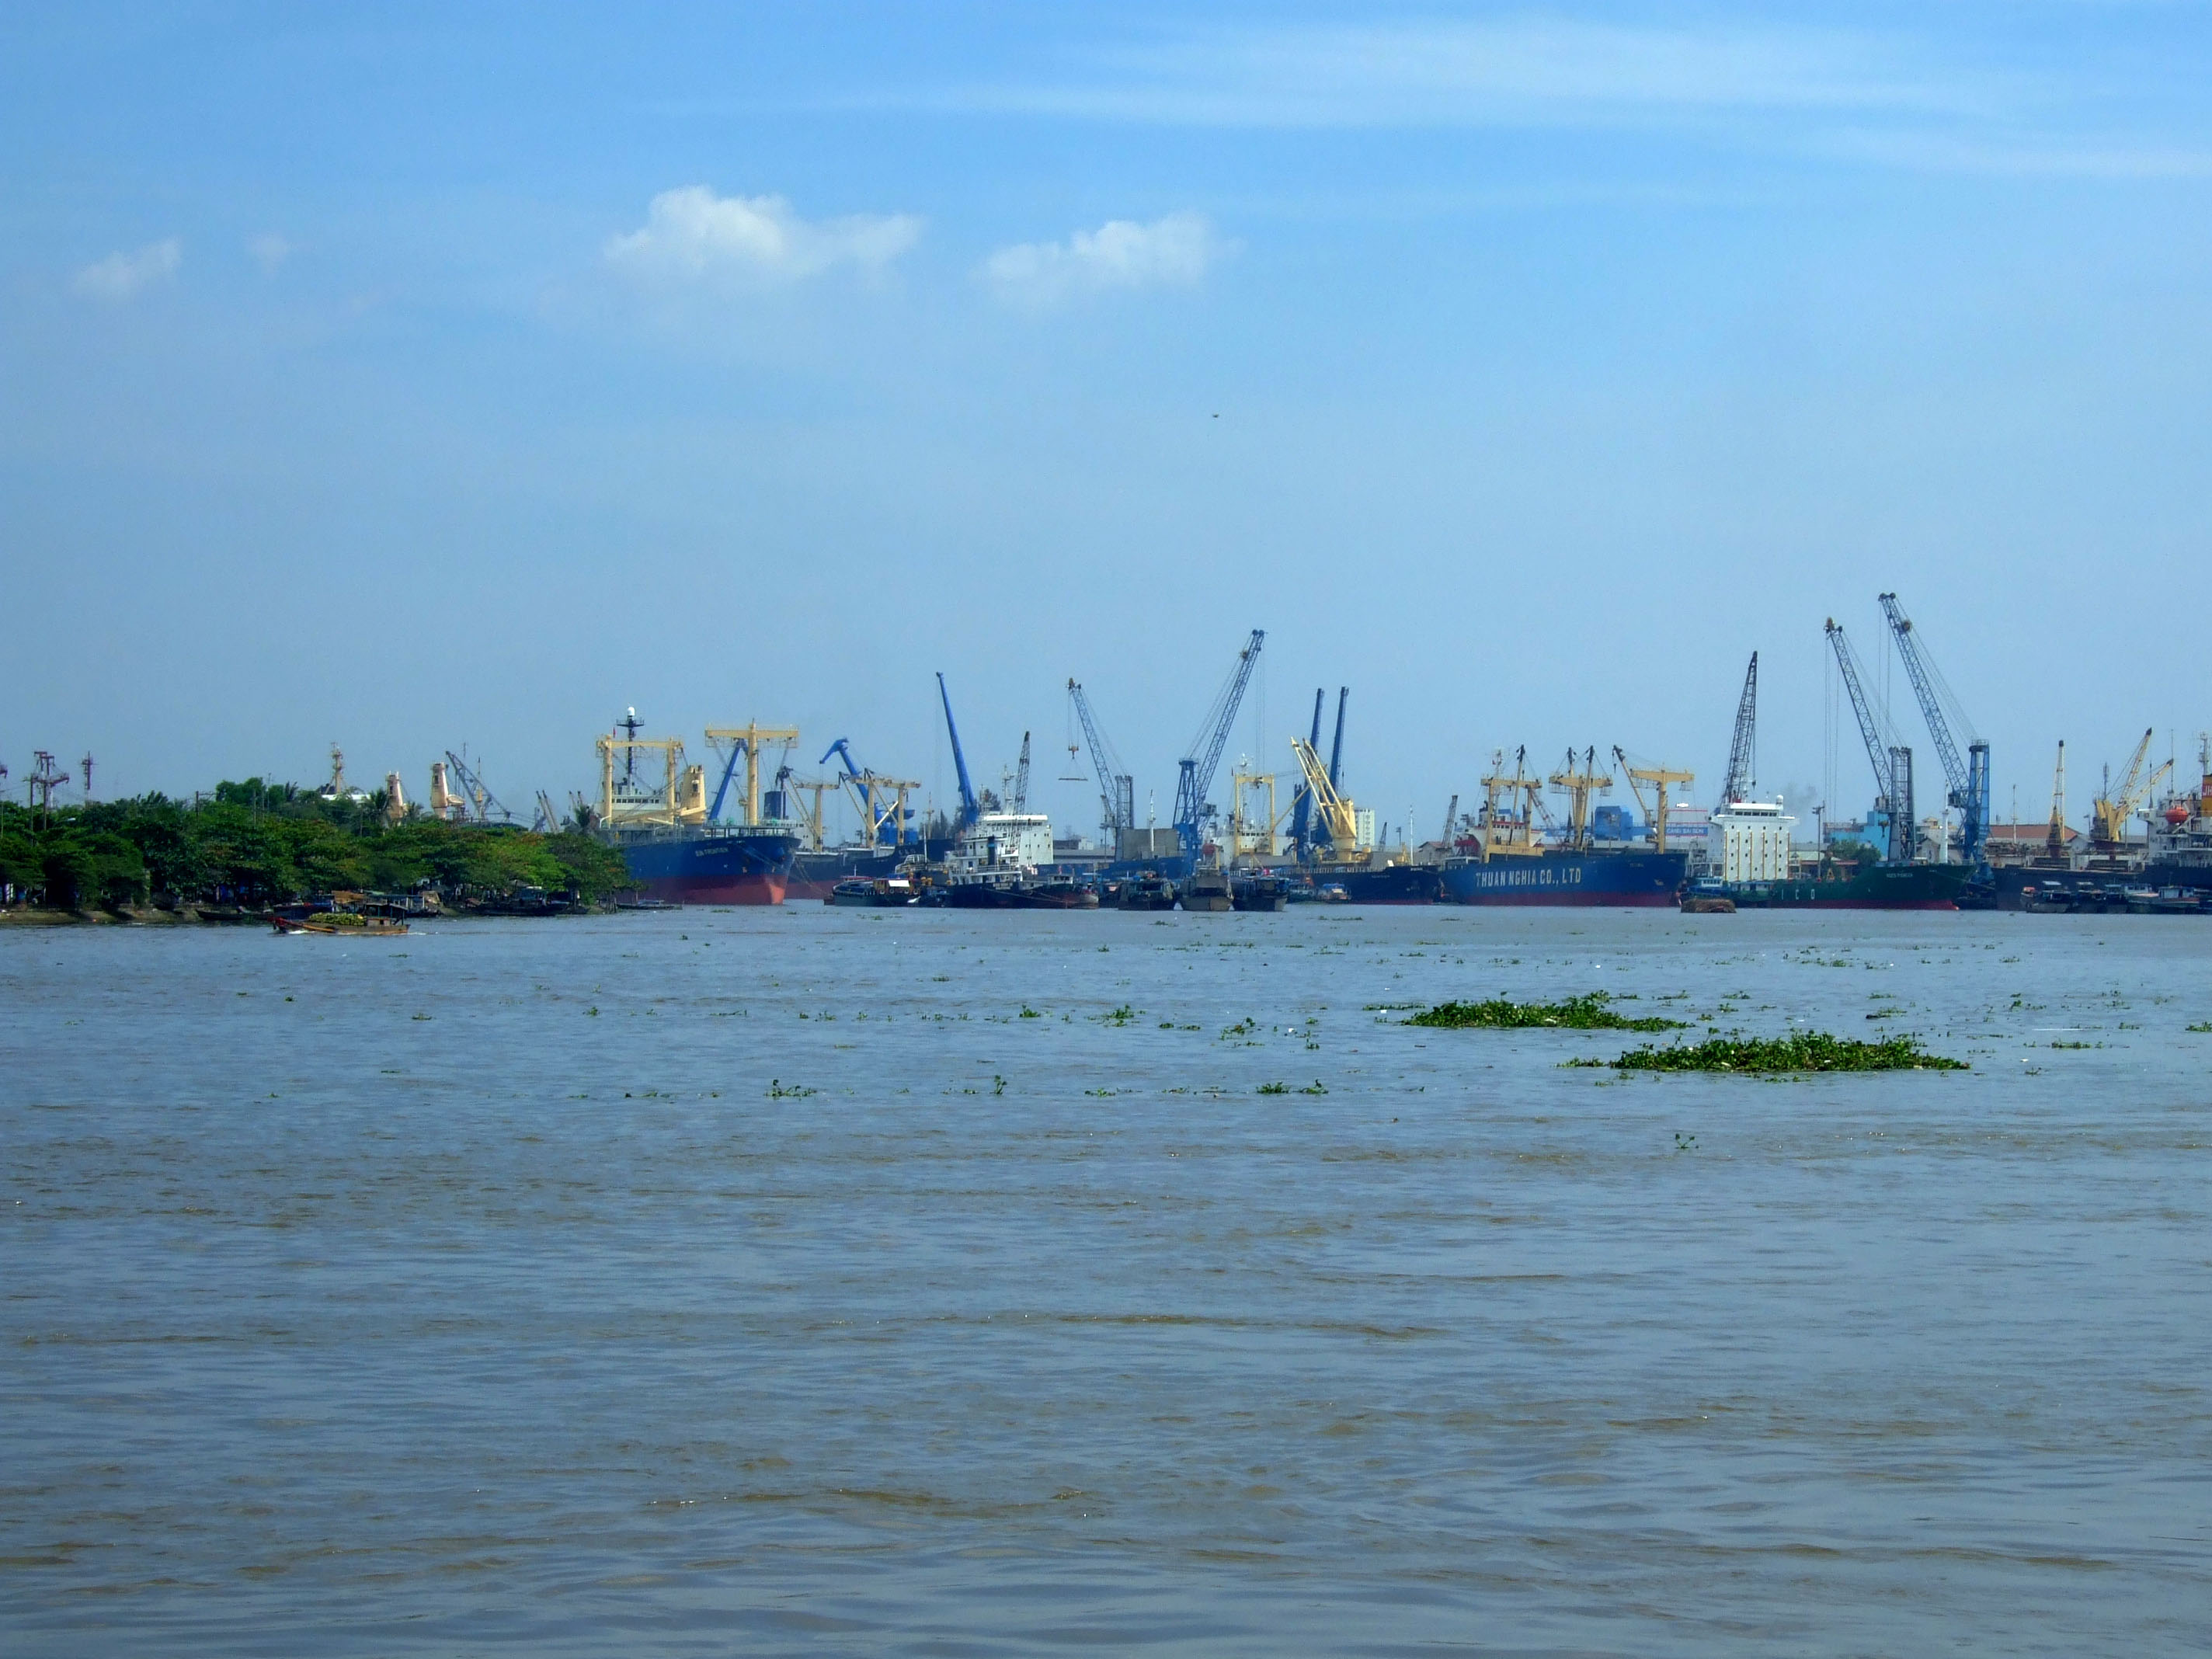 Vietnam Ho Chi Minh City Saigon harbor ships Feb 2009 05